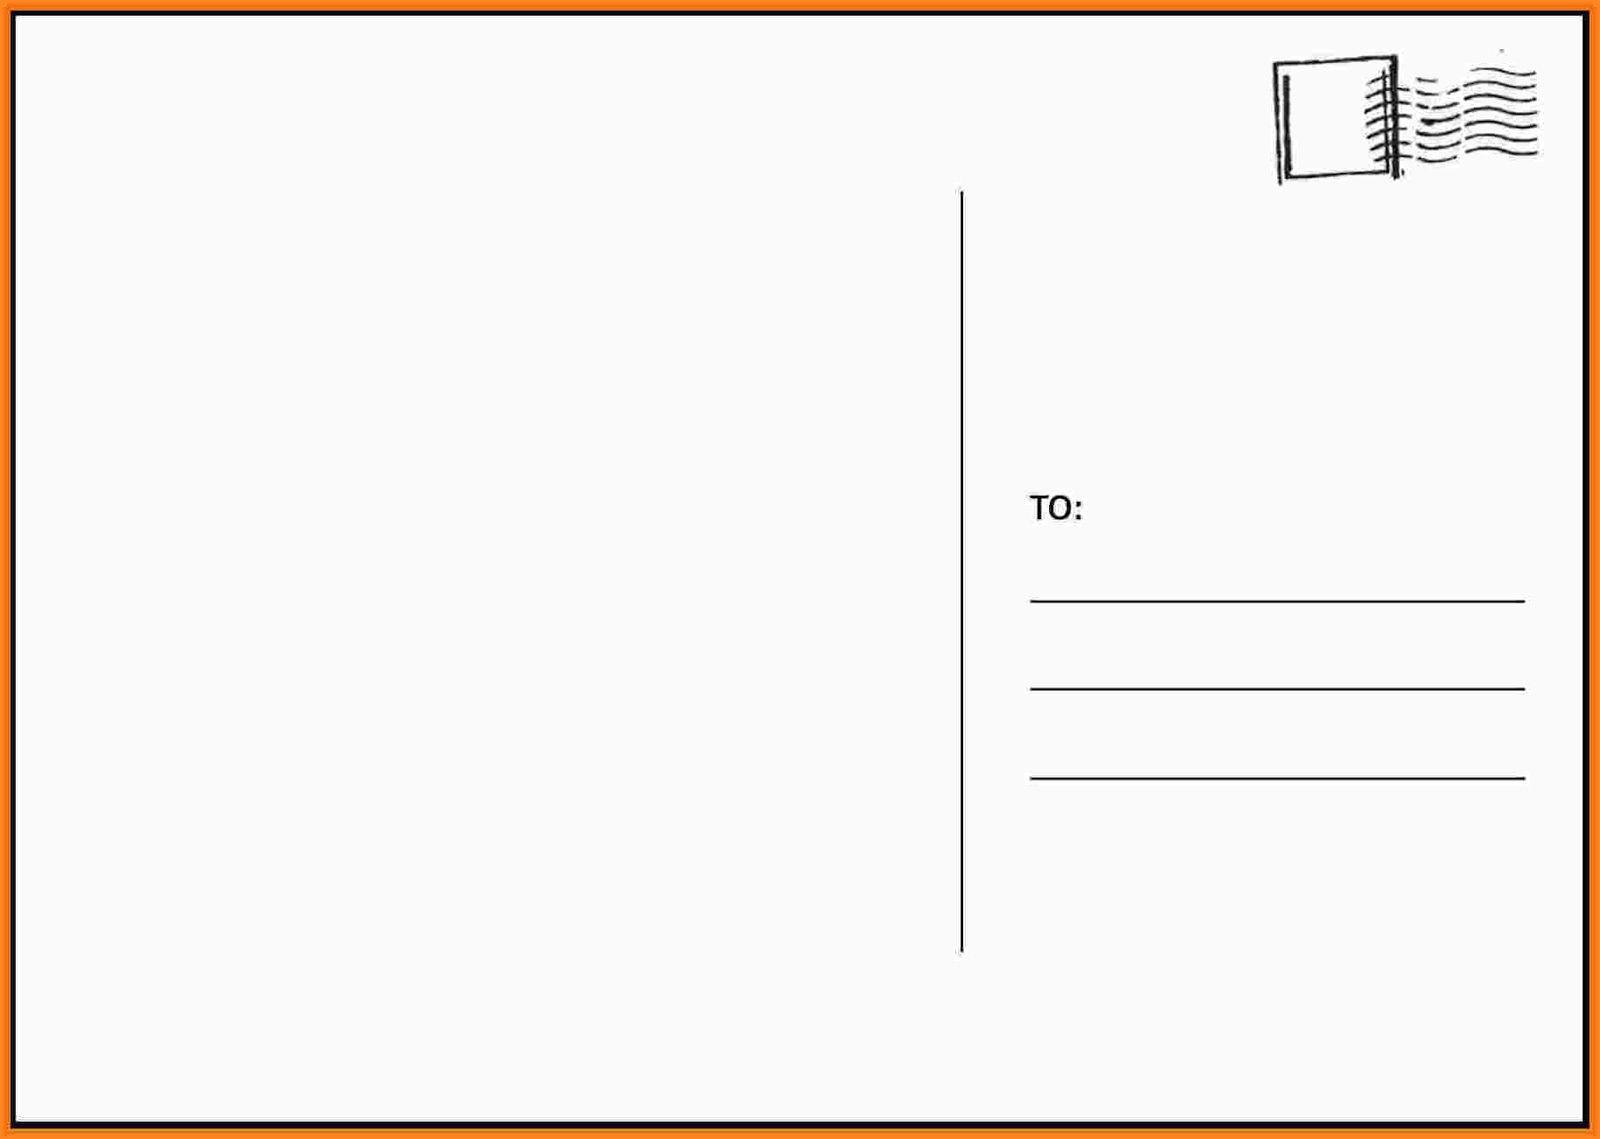 Free Printable Postcard Templates In Microsoft Word 4x6 Postcard